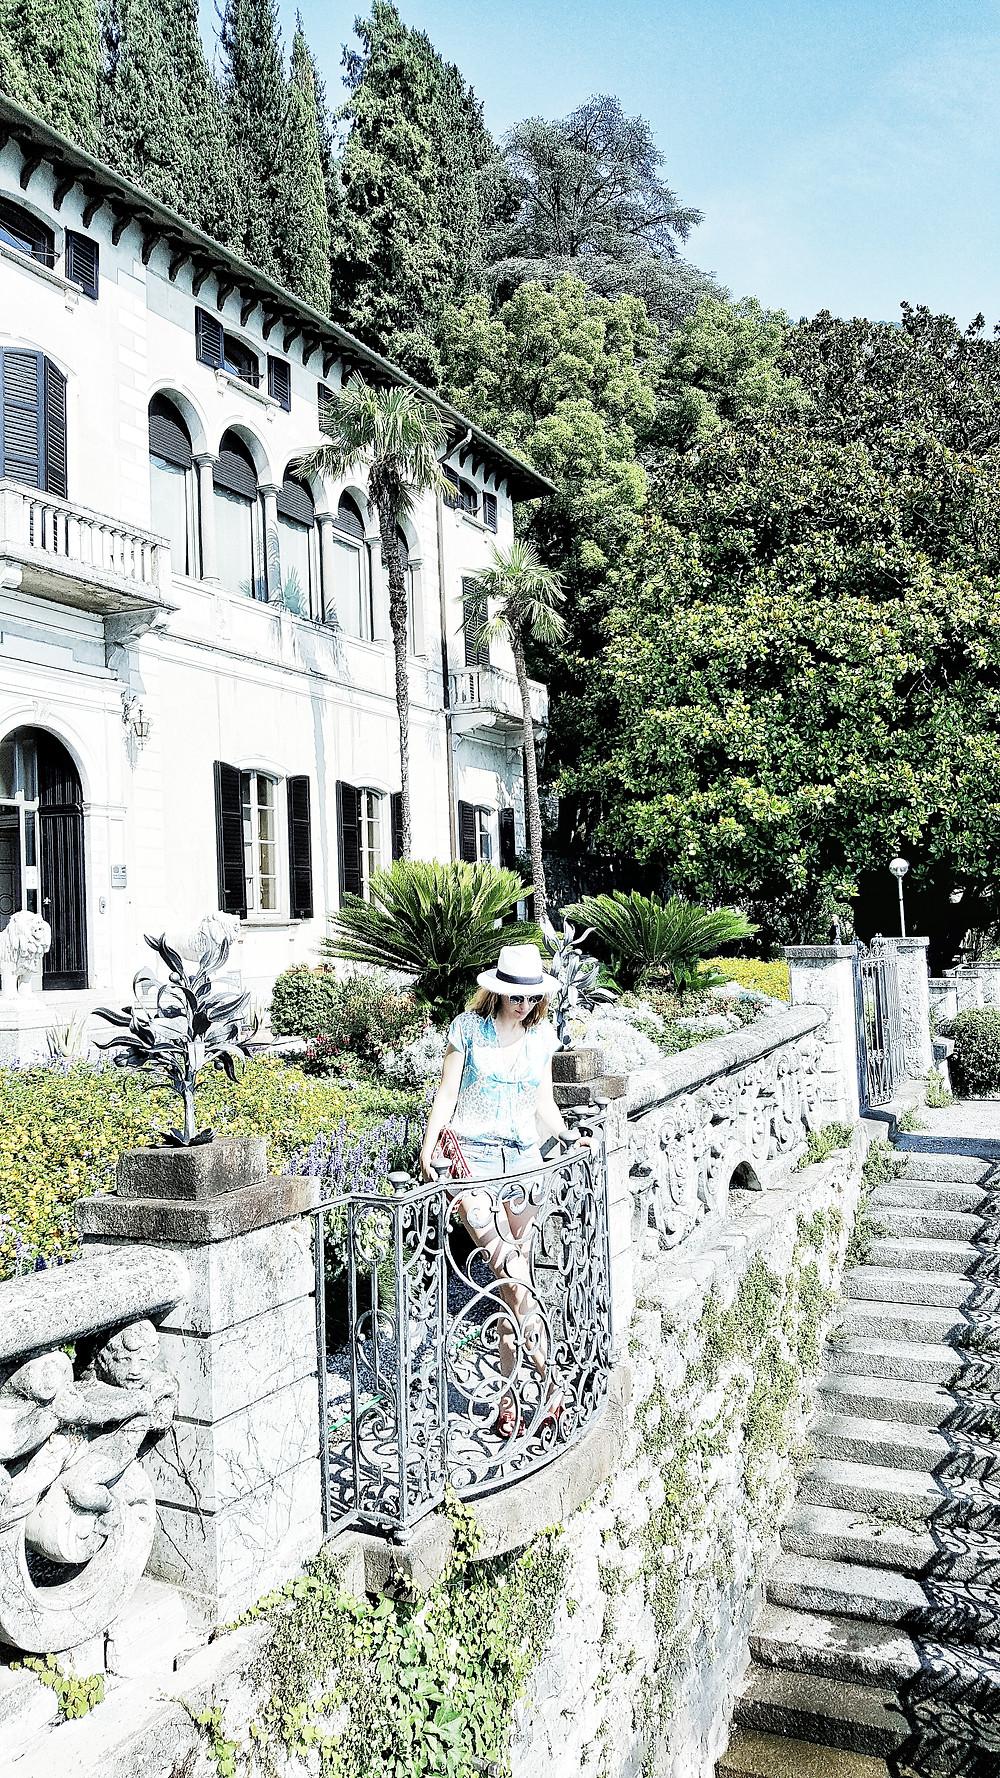 The garden of Villa Monasteri